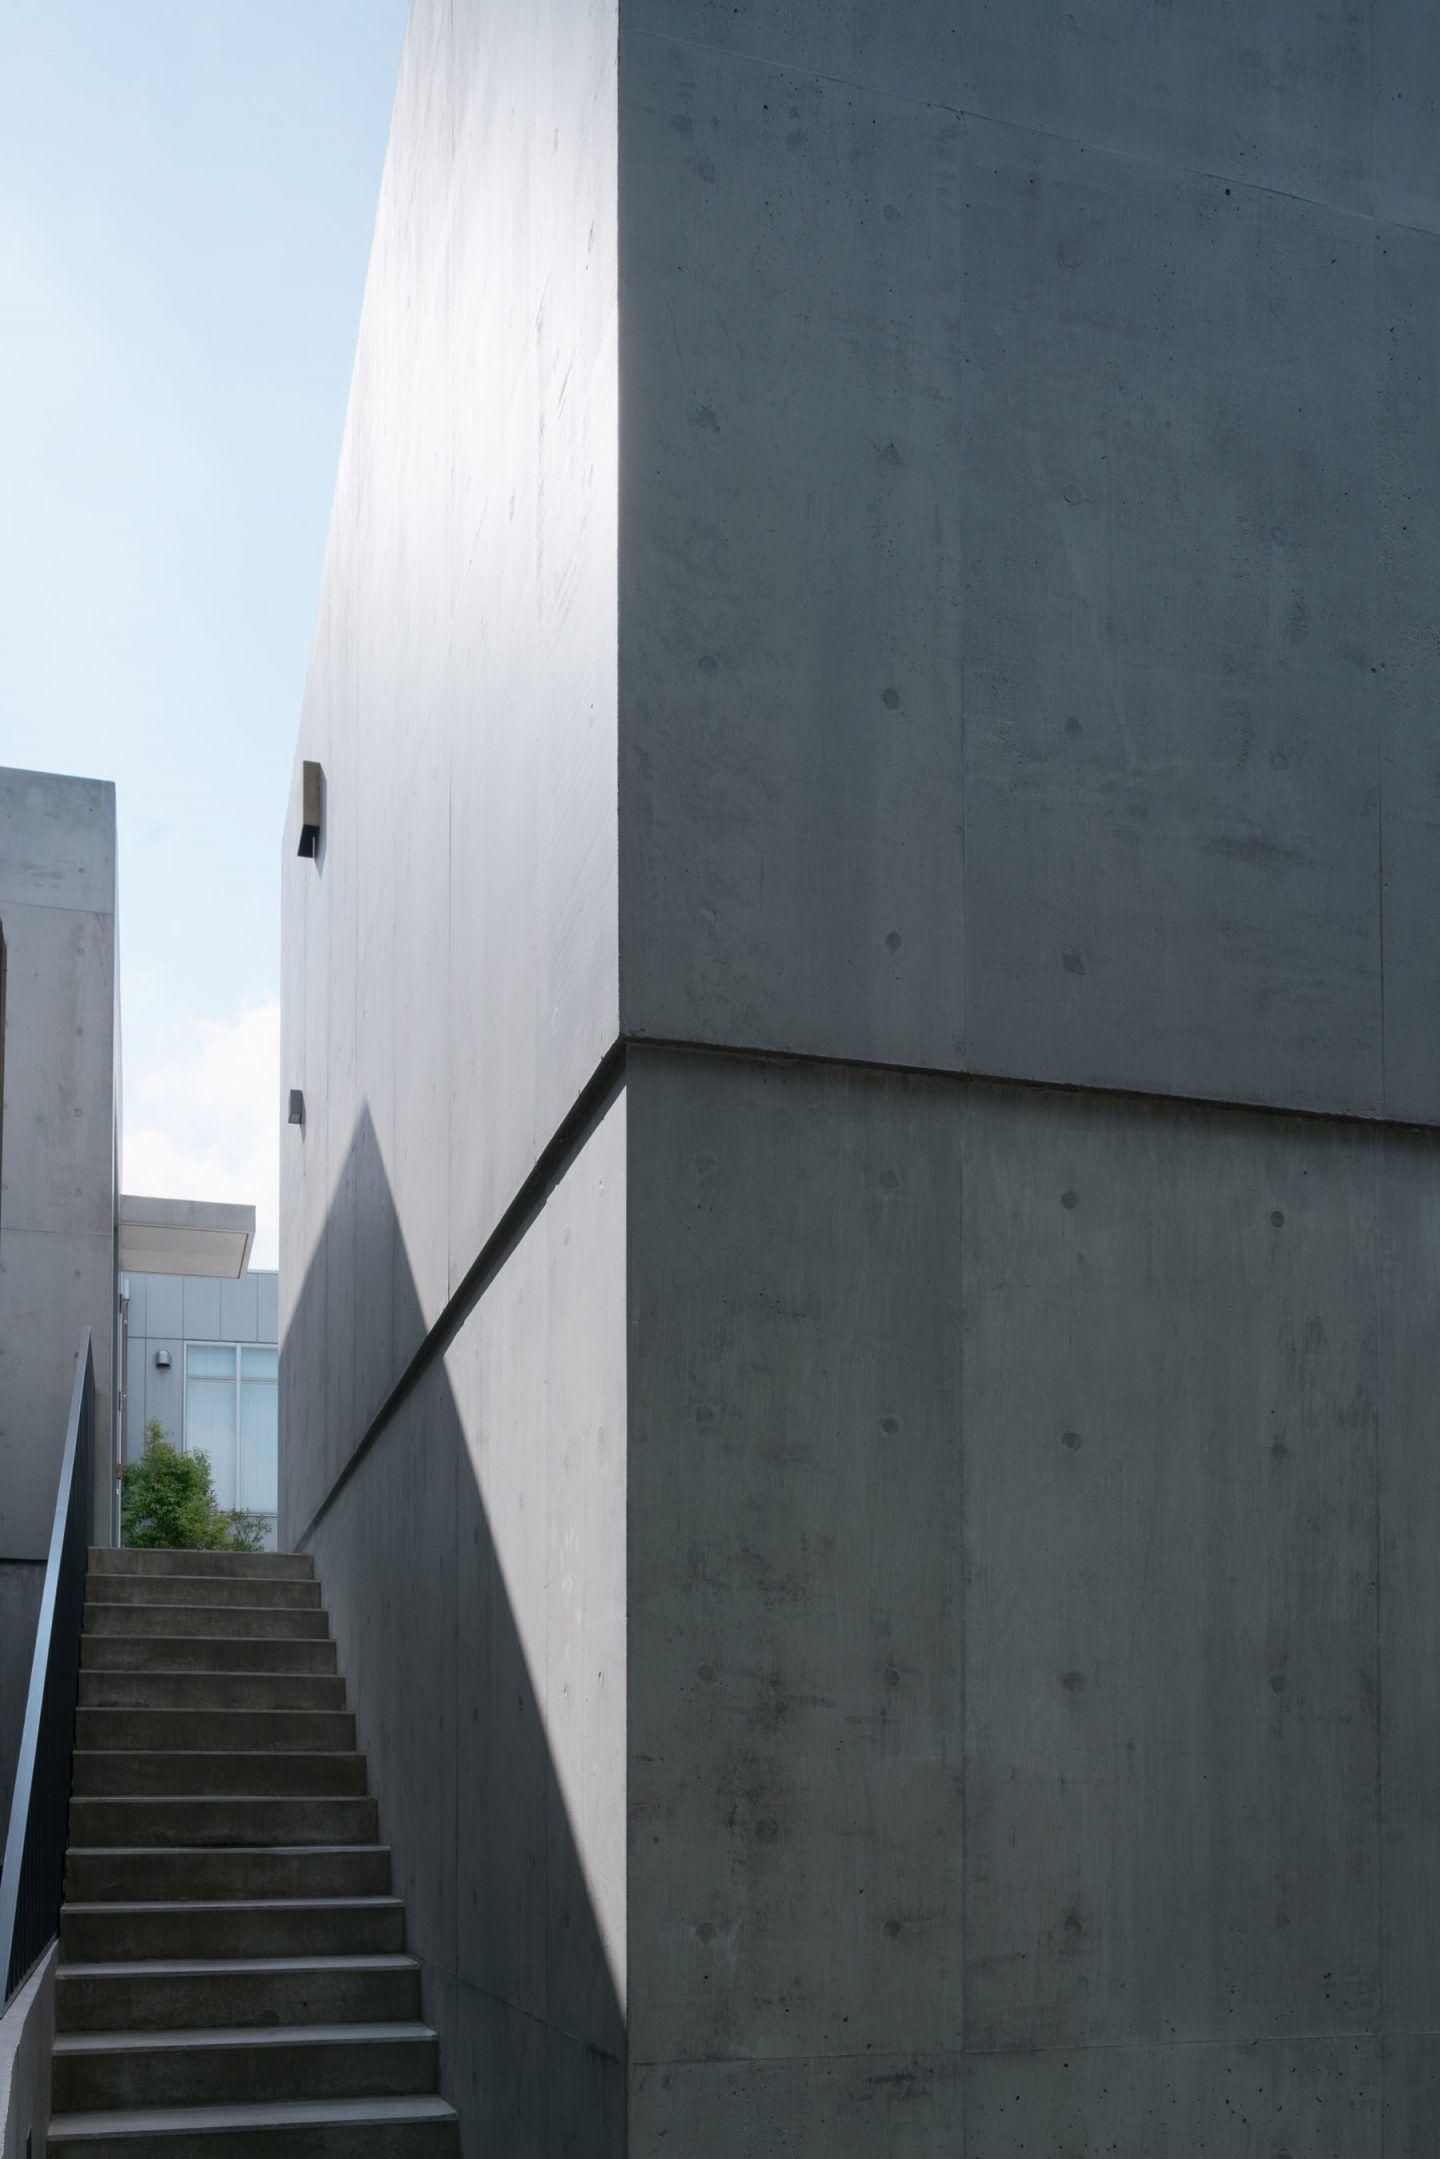 IGNANT-Travel-Nobuo-Araki-The-Mass-07